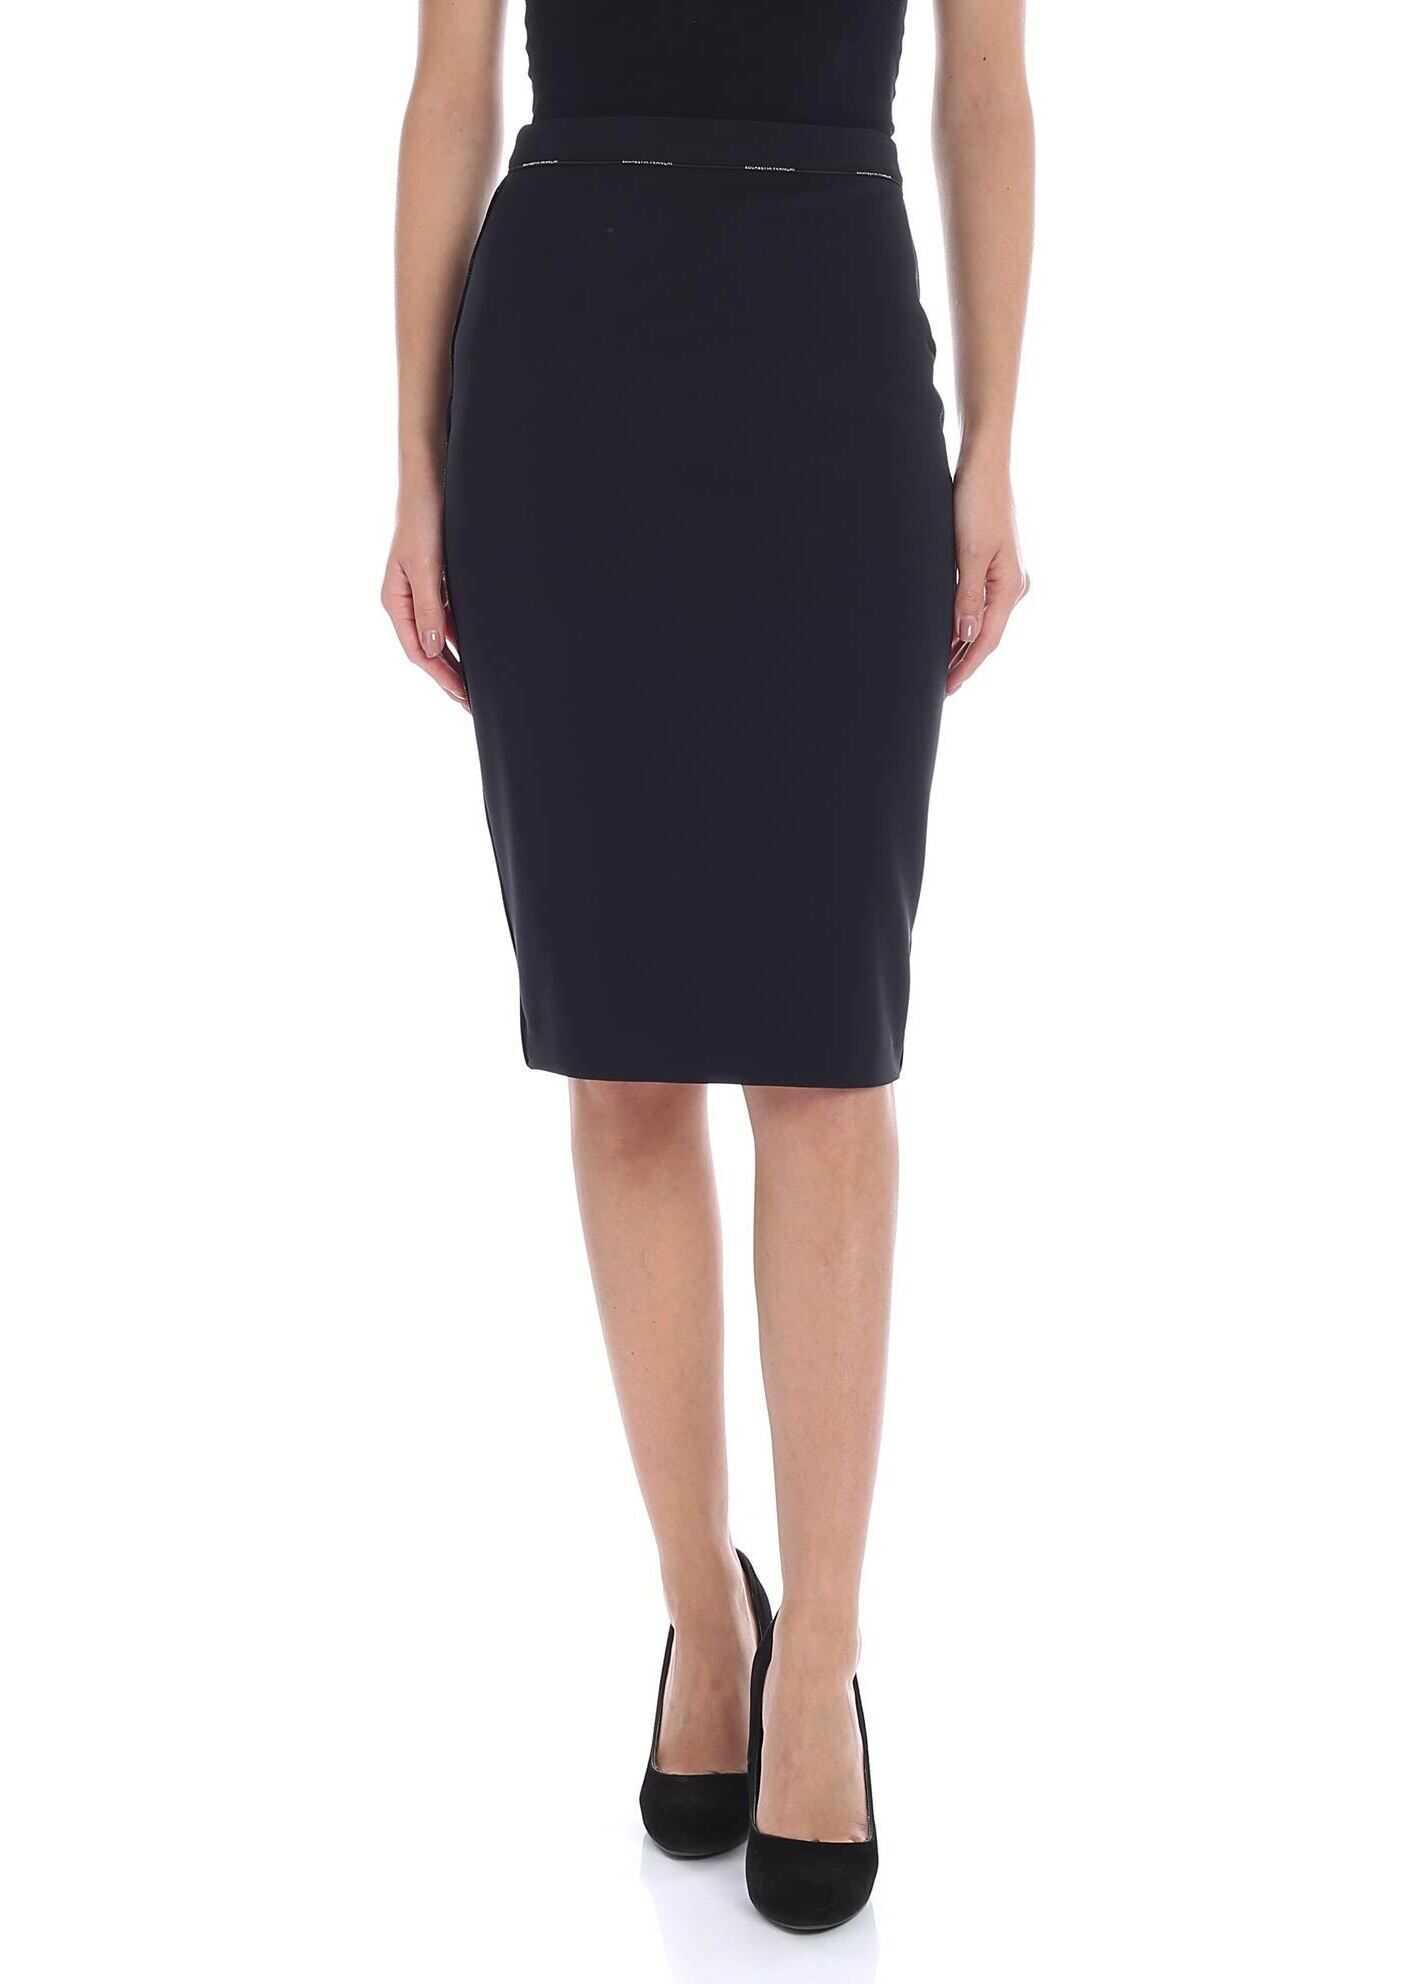 Elisabetta Franchi Black Pencil Skirt With Logo Black